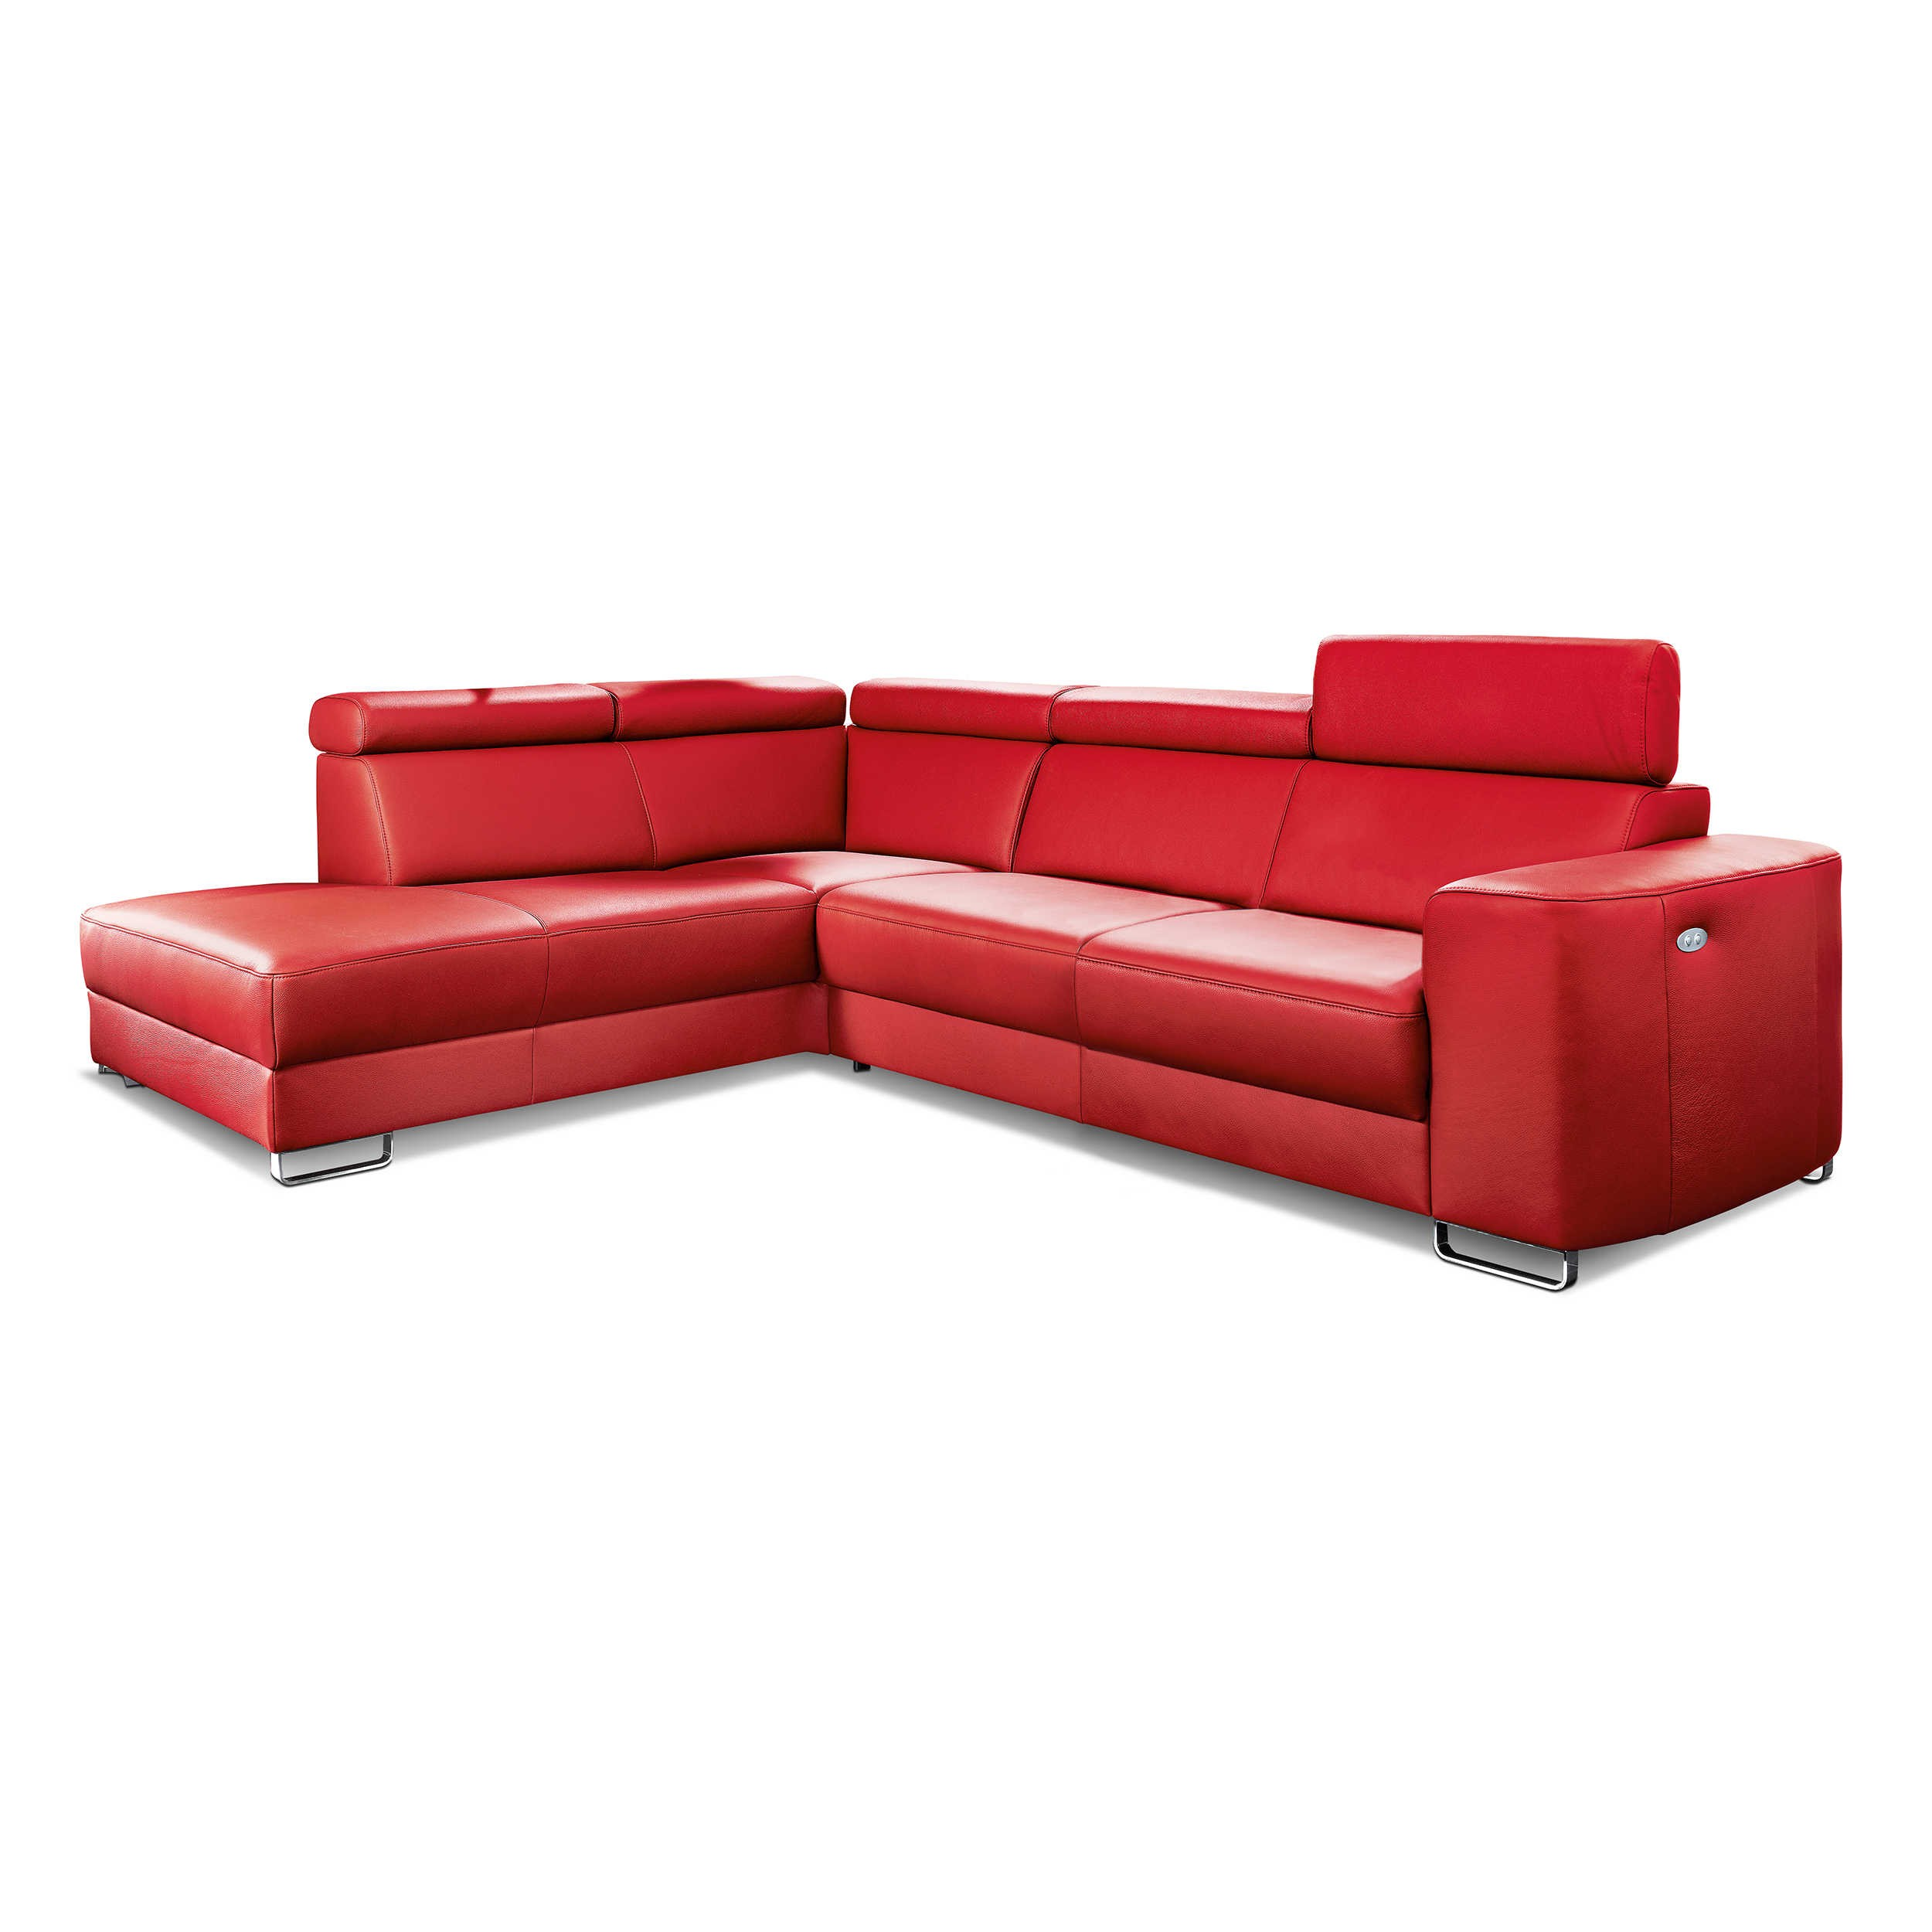 ecksofa simon rot leder online kaufen bei woonio. Black Bedroom Furniture Sets. Home Design Ideas